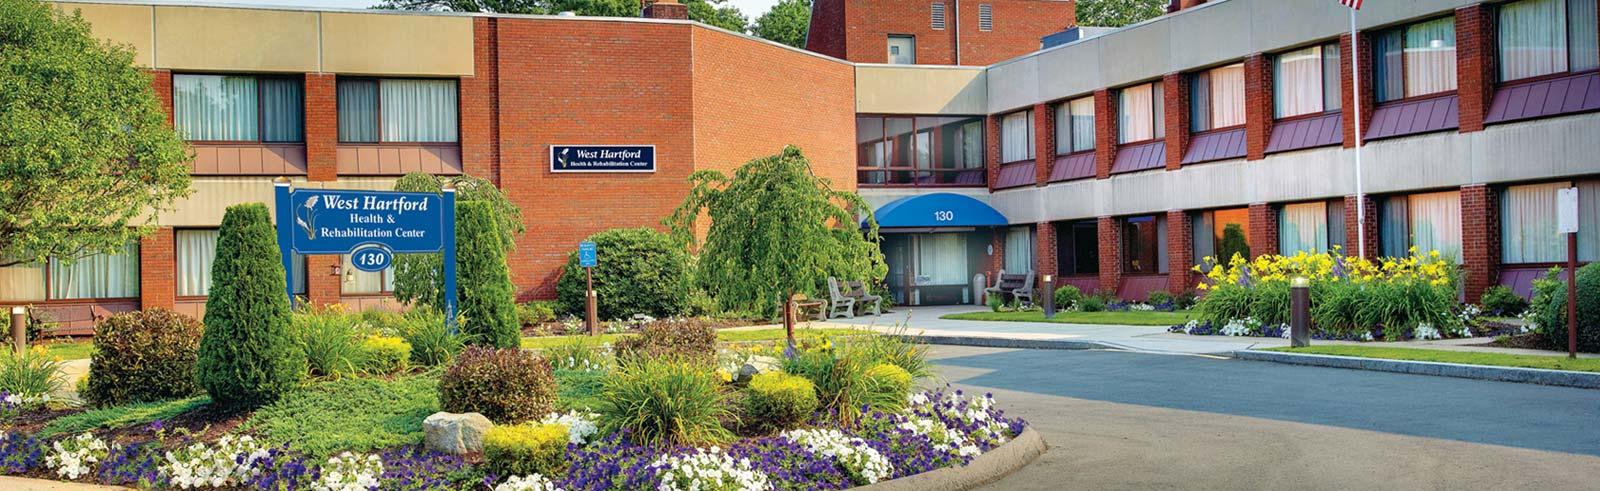 West Hartford Health & Rehabilitation Building